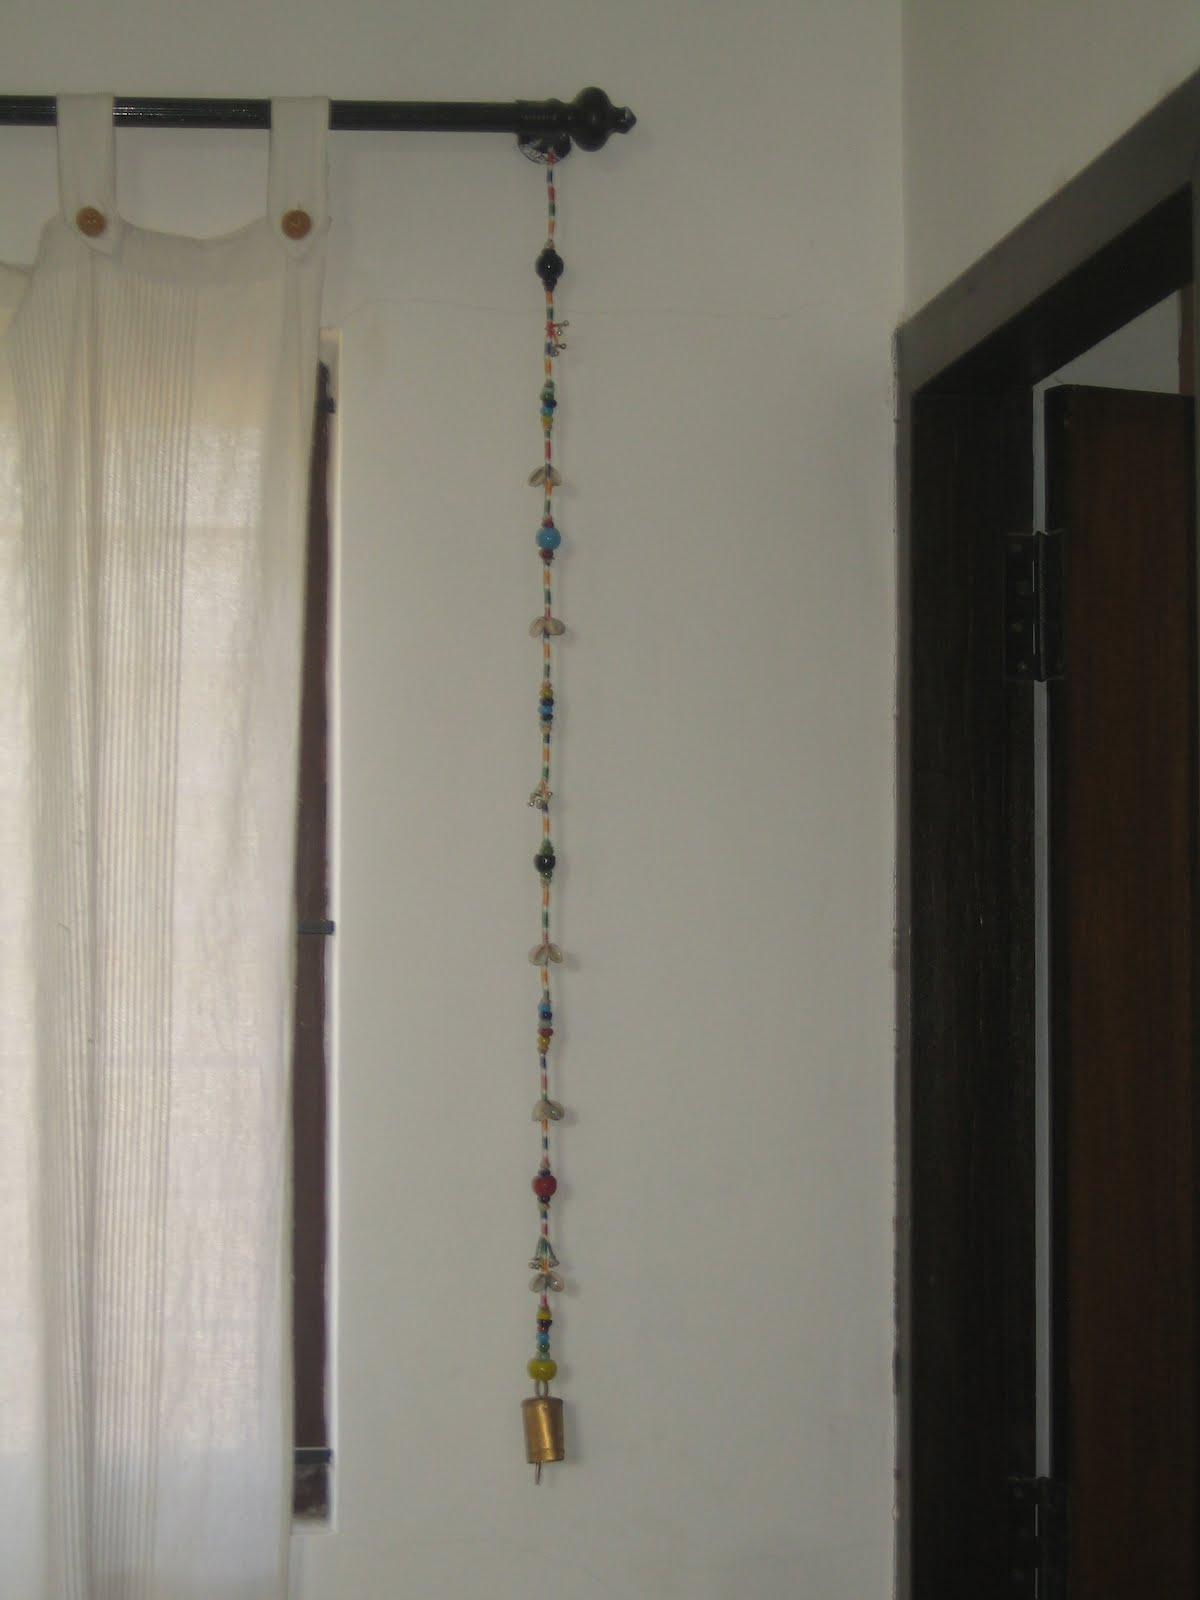 Curtain hangings